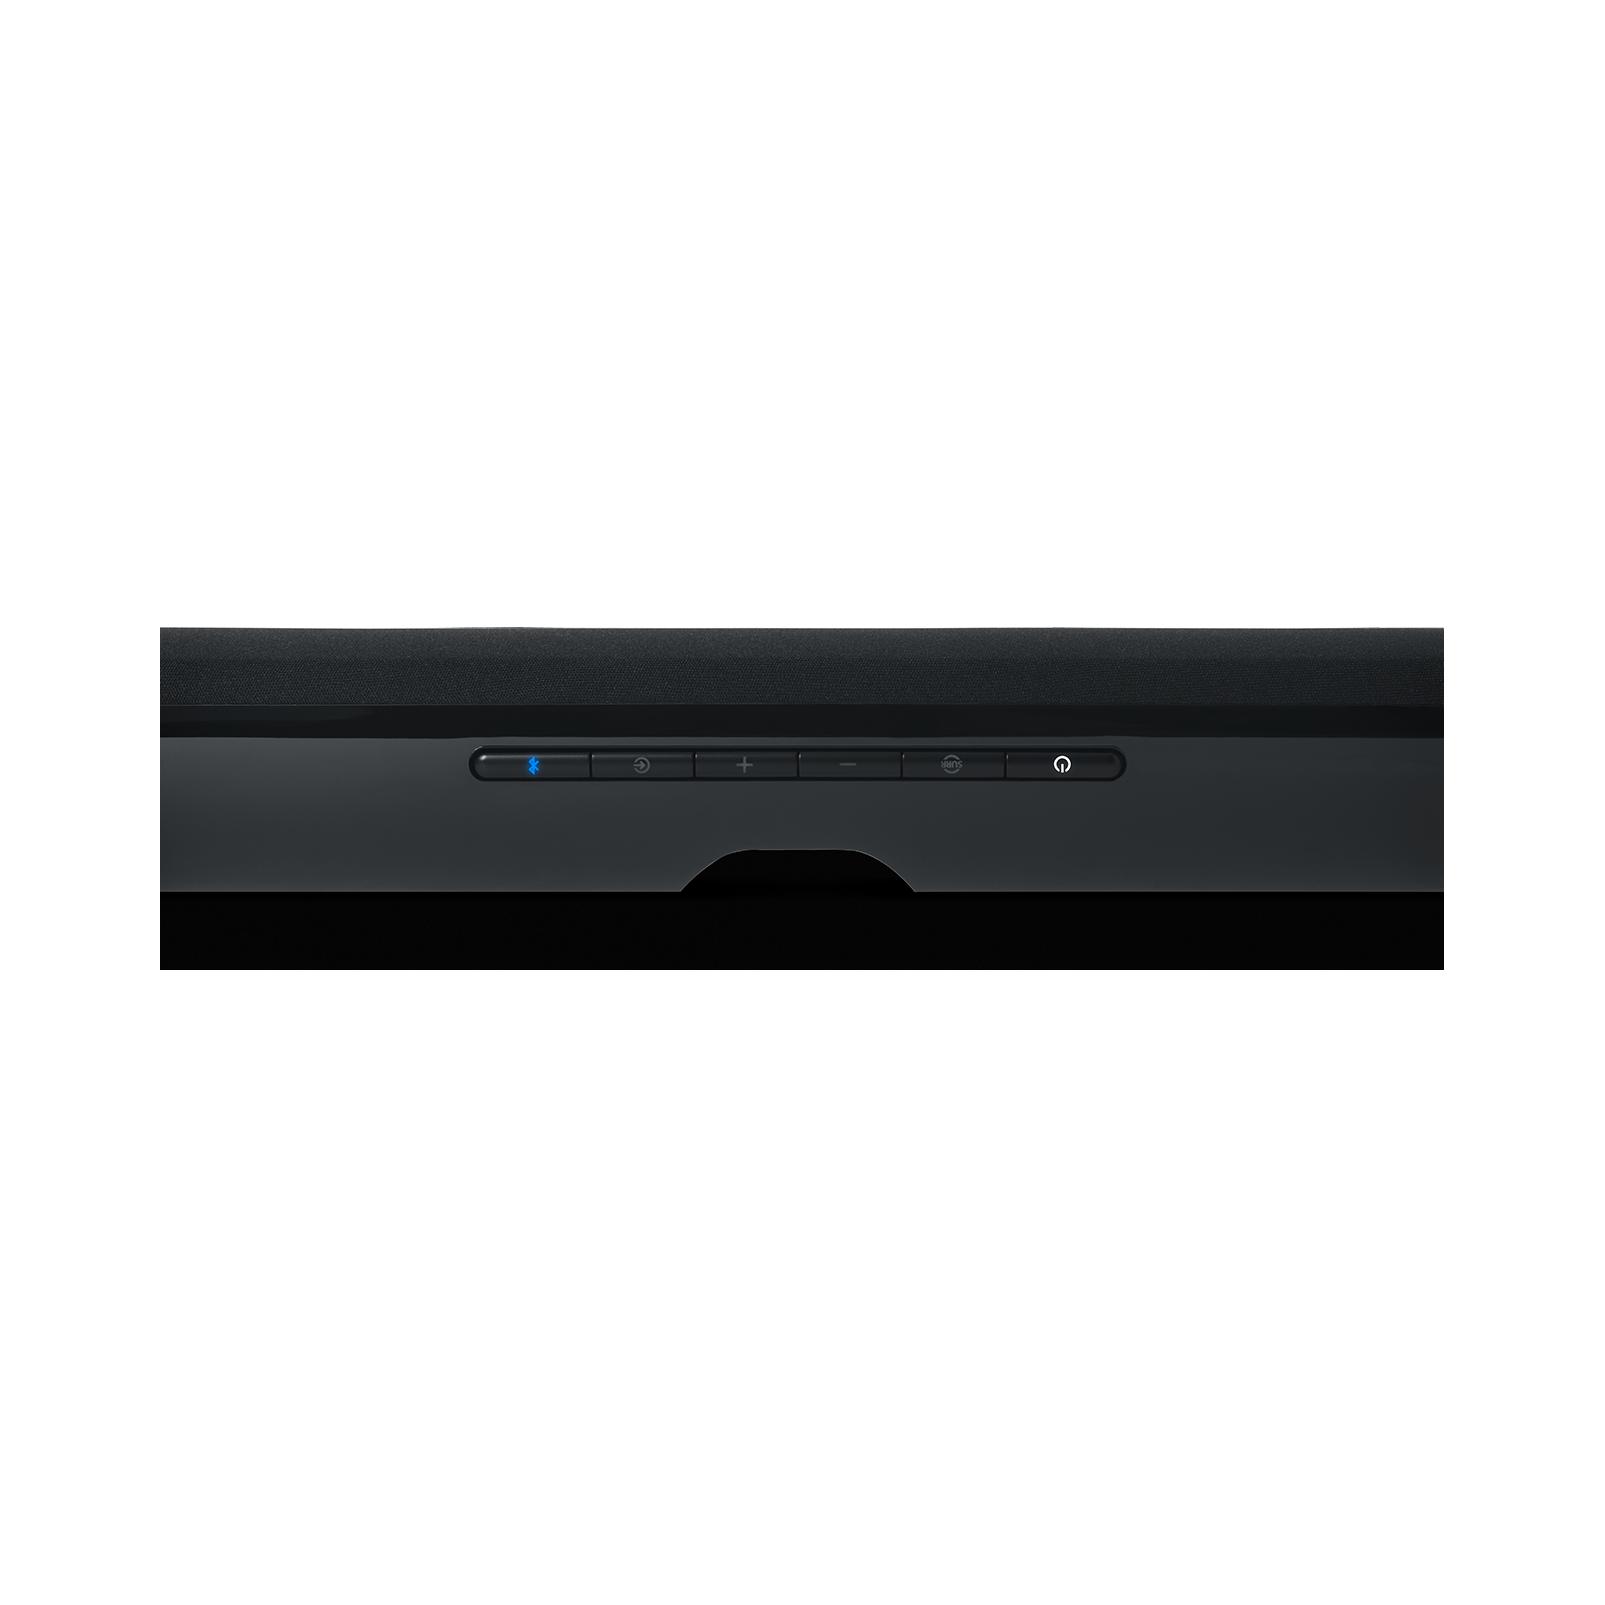 HK SB20 - Black - Advanced soundbar with Bluetooth and powerful wireless subwoofer - Detailshot 3